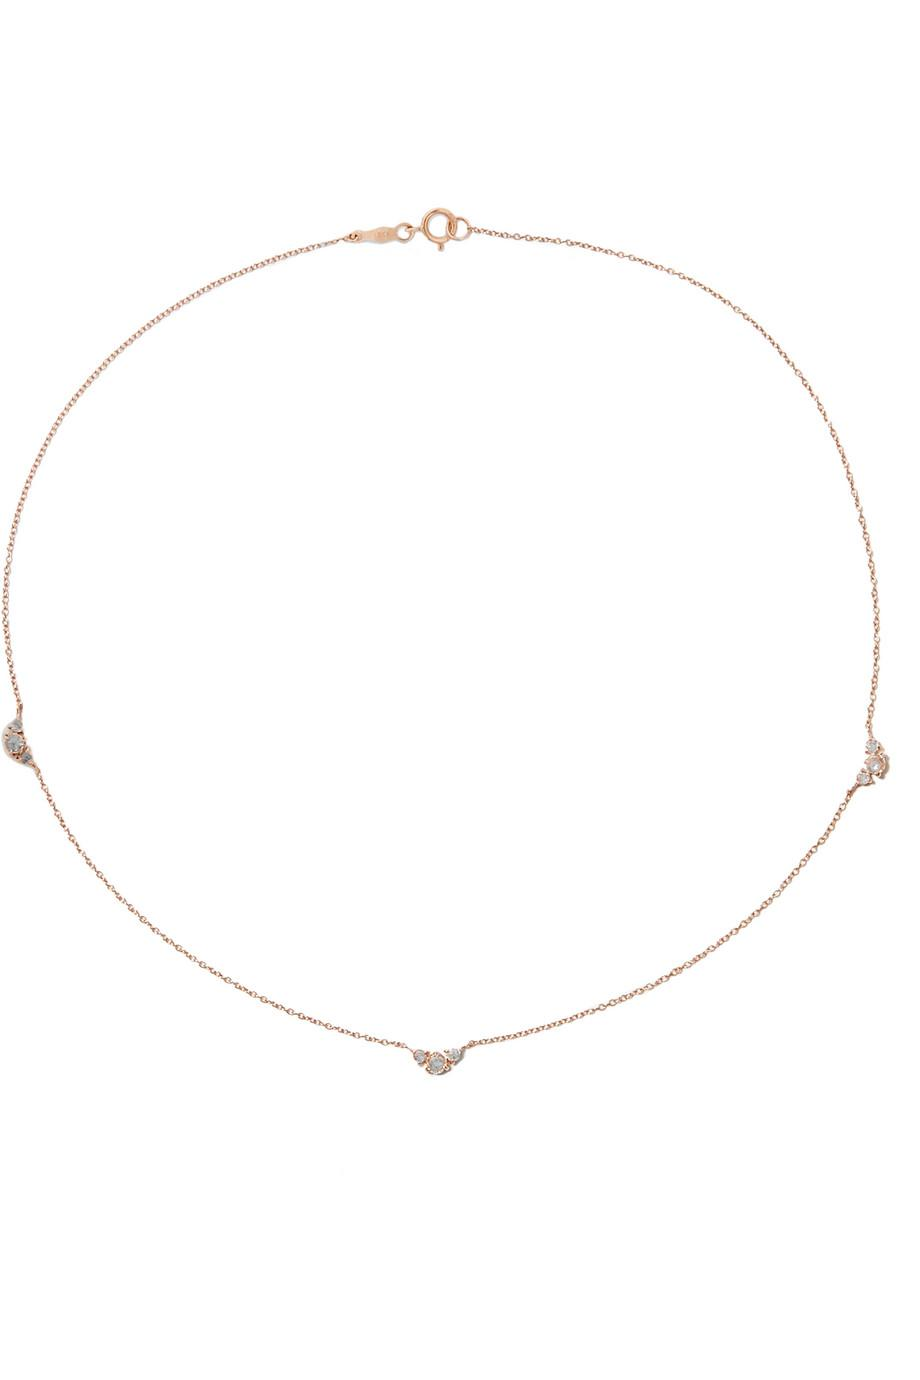 Catbird Sleeping Beauty 14-karat Rose Gold Diamond Necklace NUW2GzOda